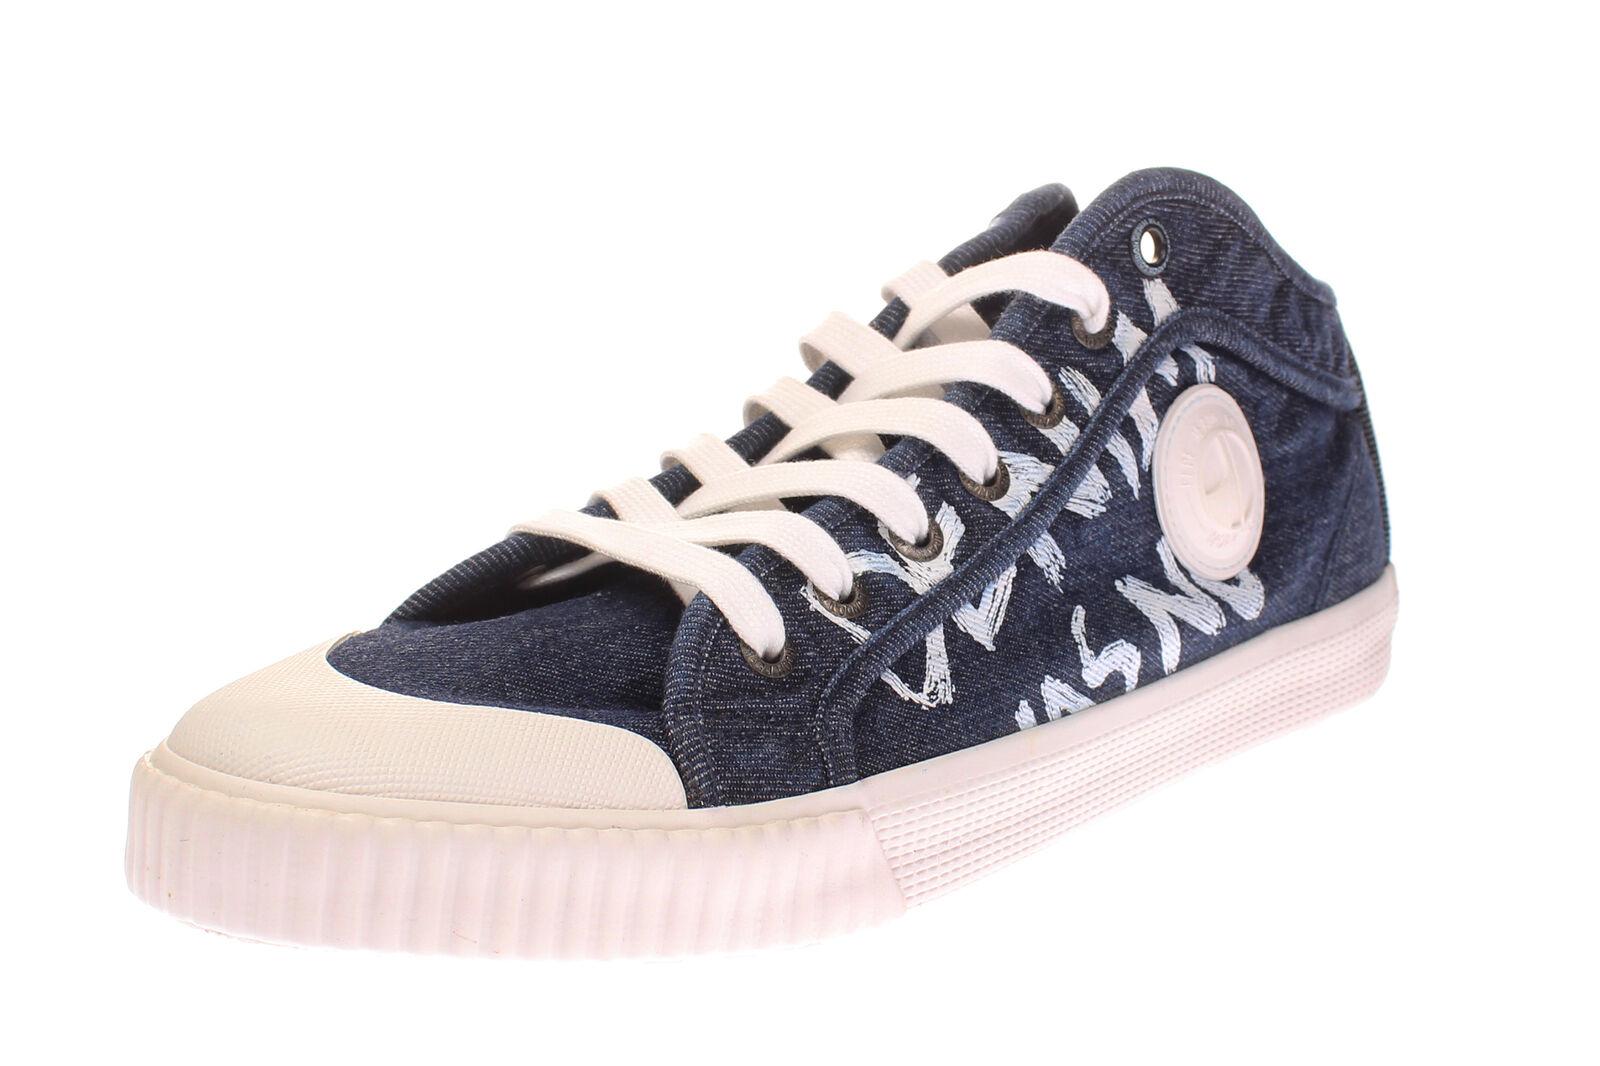 Pepe Footwear PMS30548 - Herren Schuhe Turnschuhe - 559-dr-denim